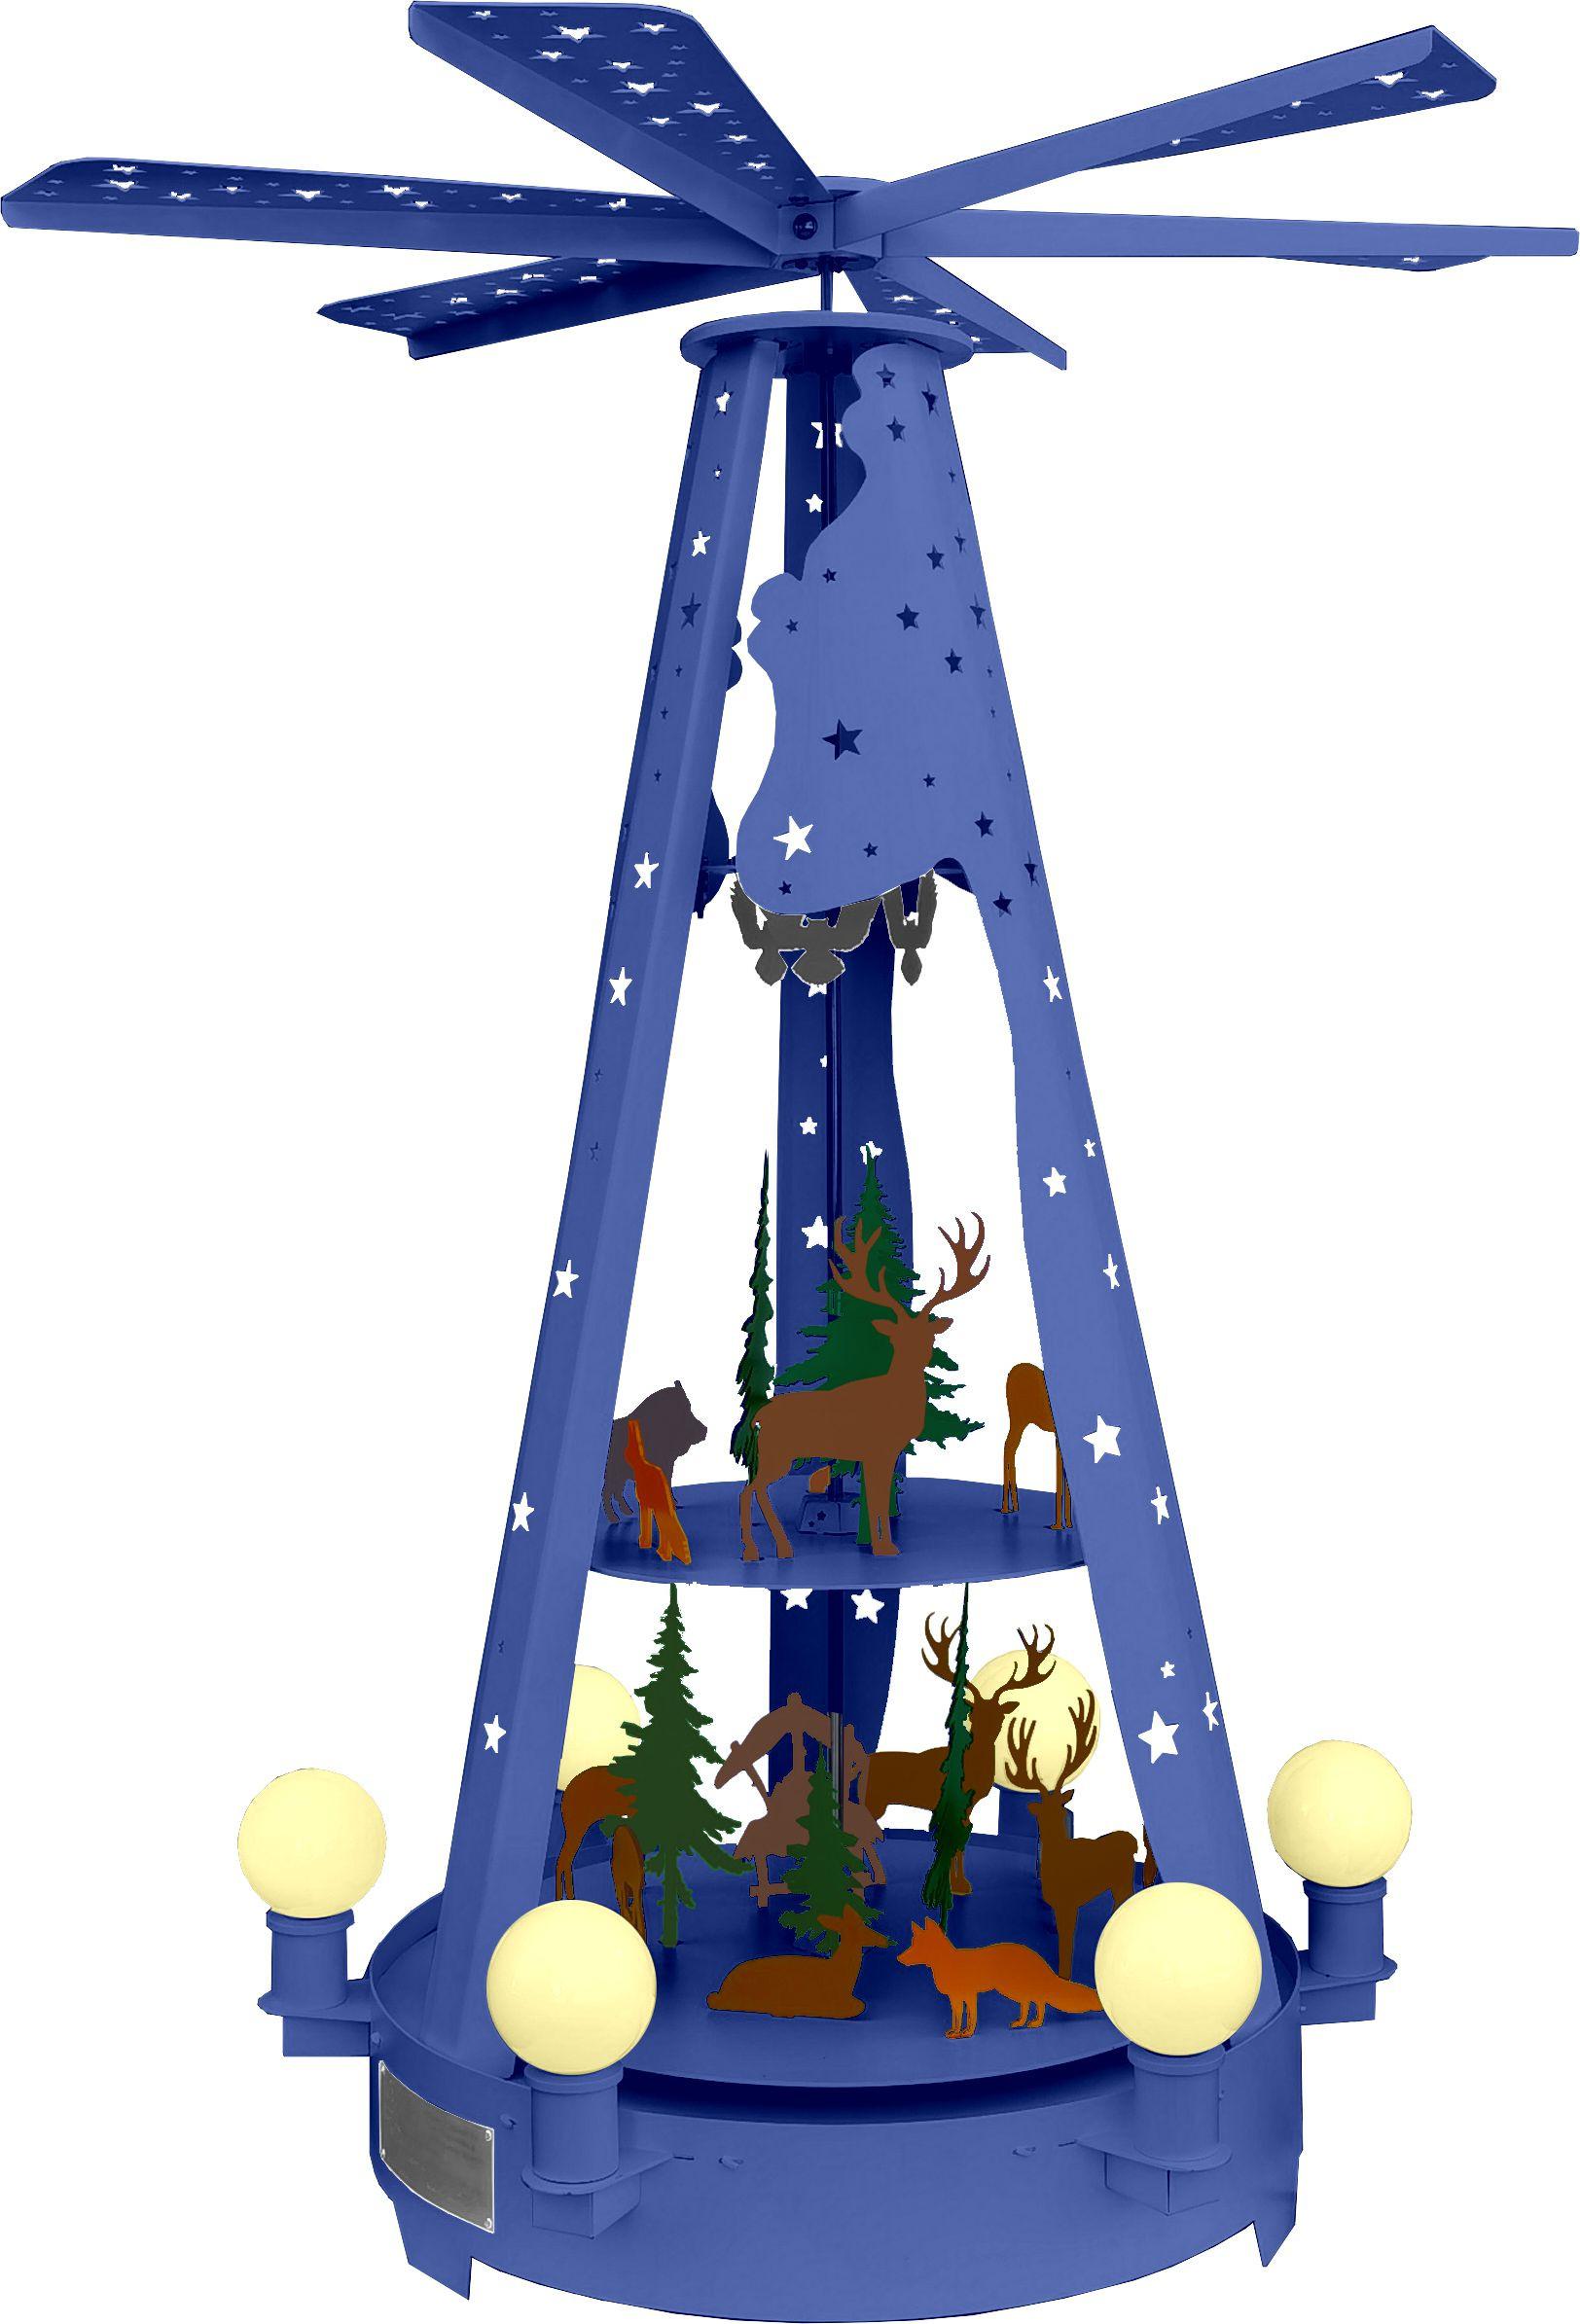 Außenpyramide aus Metall - Waldmotiv, blau